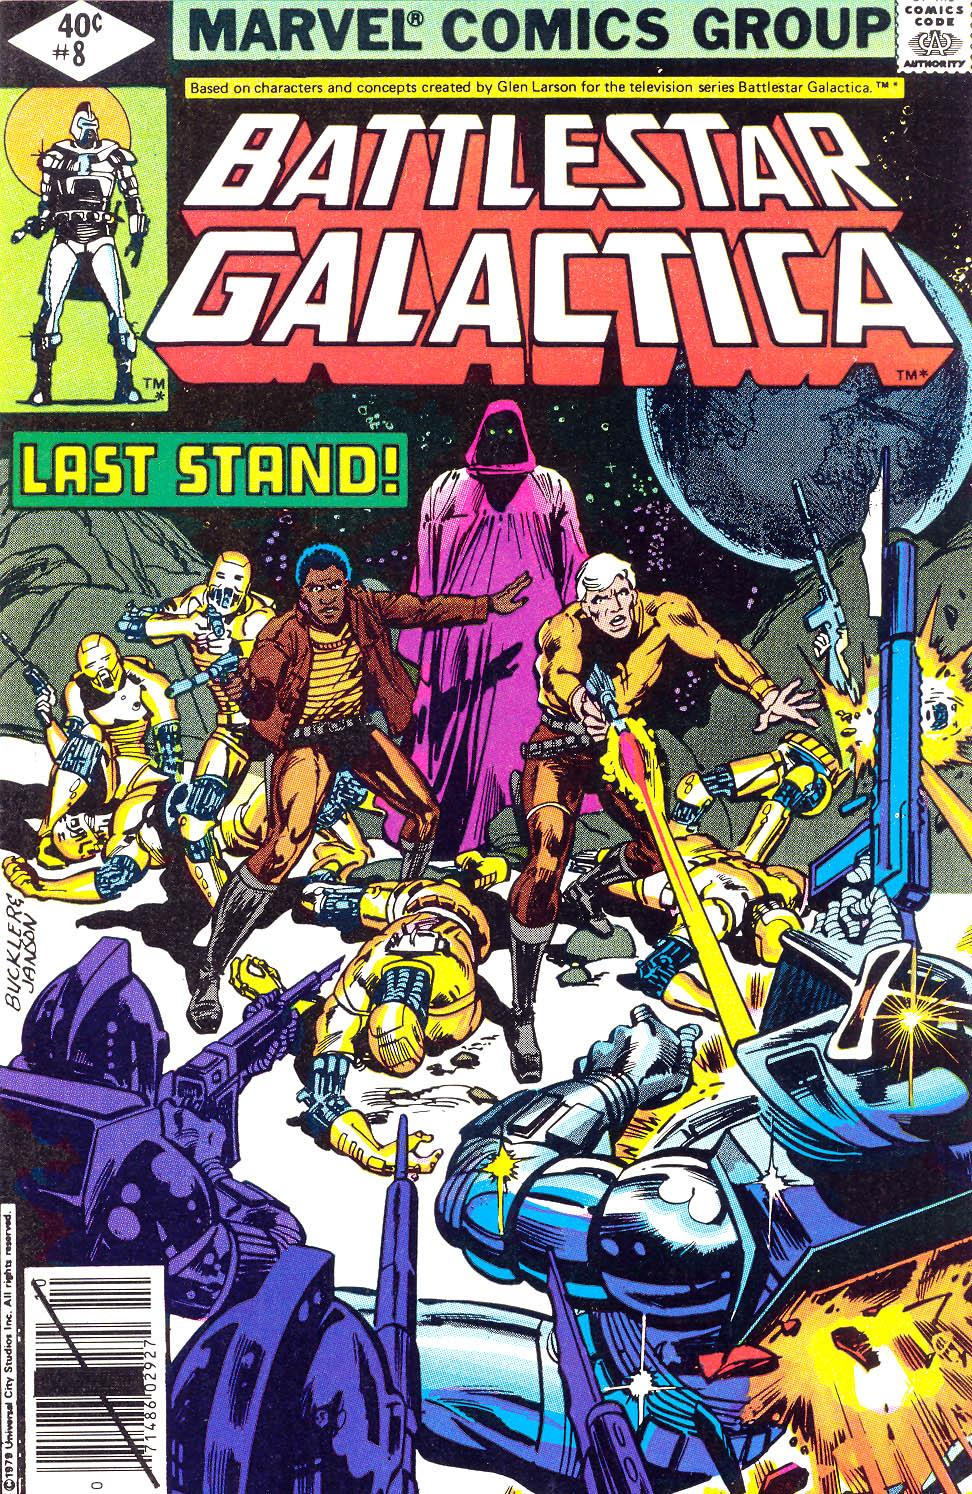 Battlestar Galactica 8 Page 1